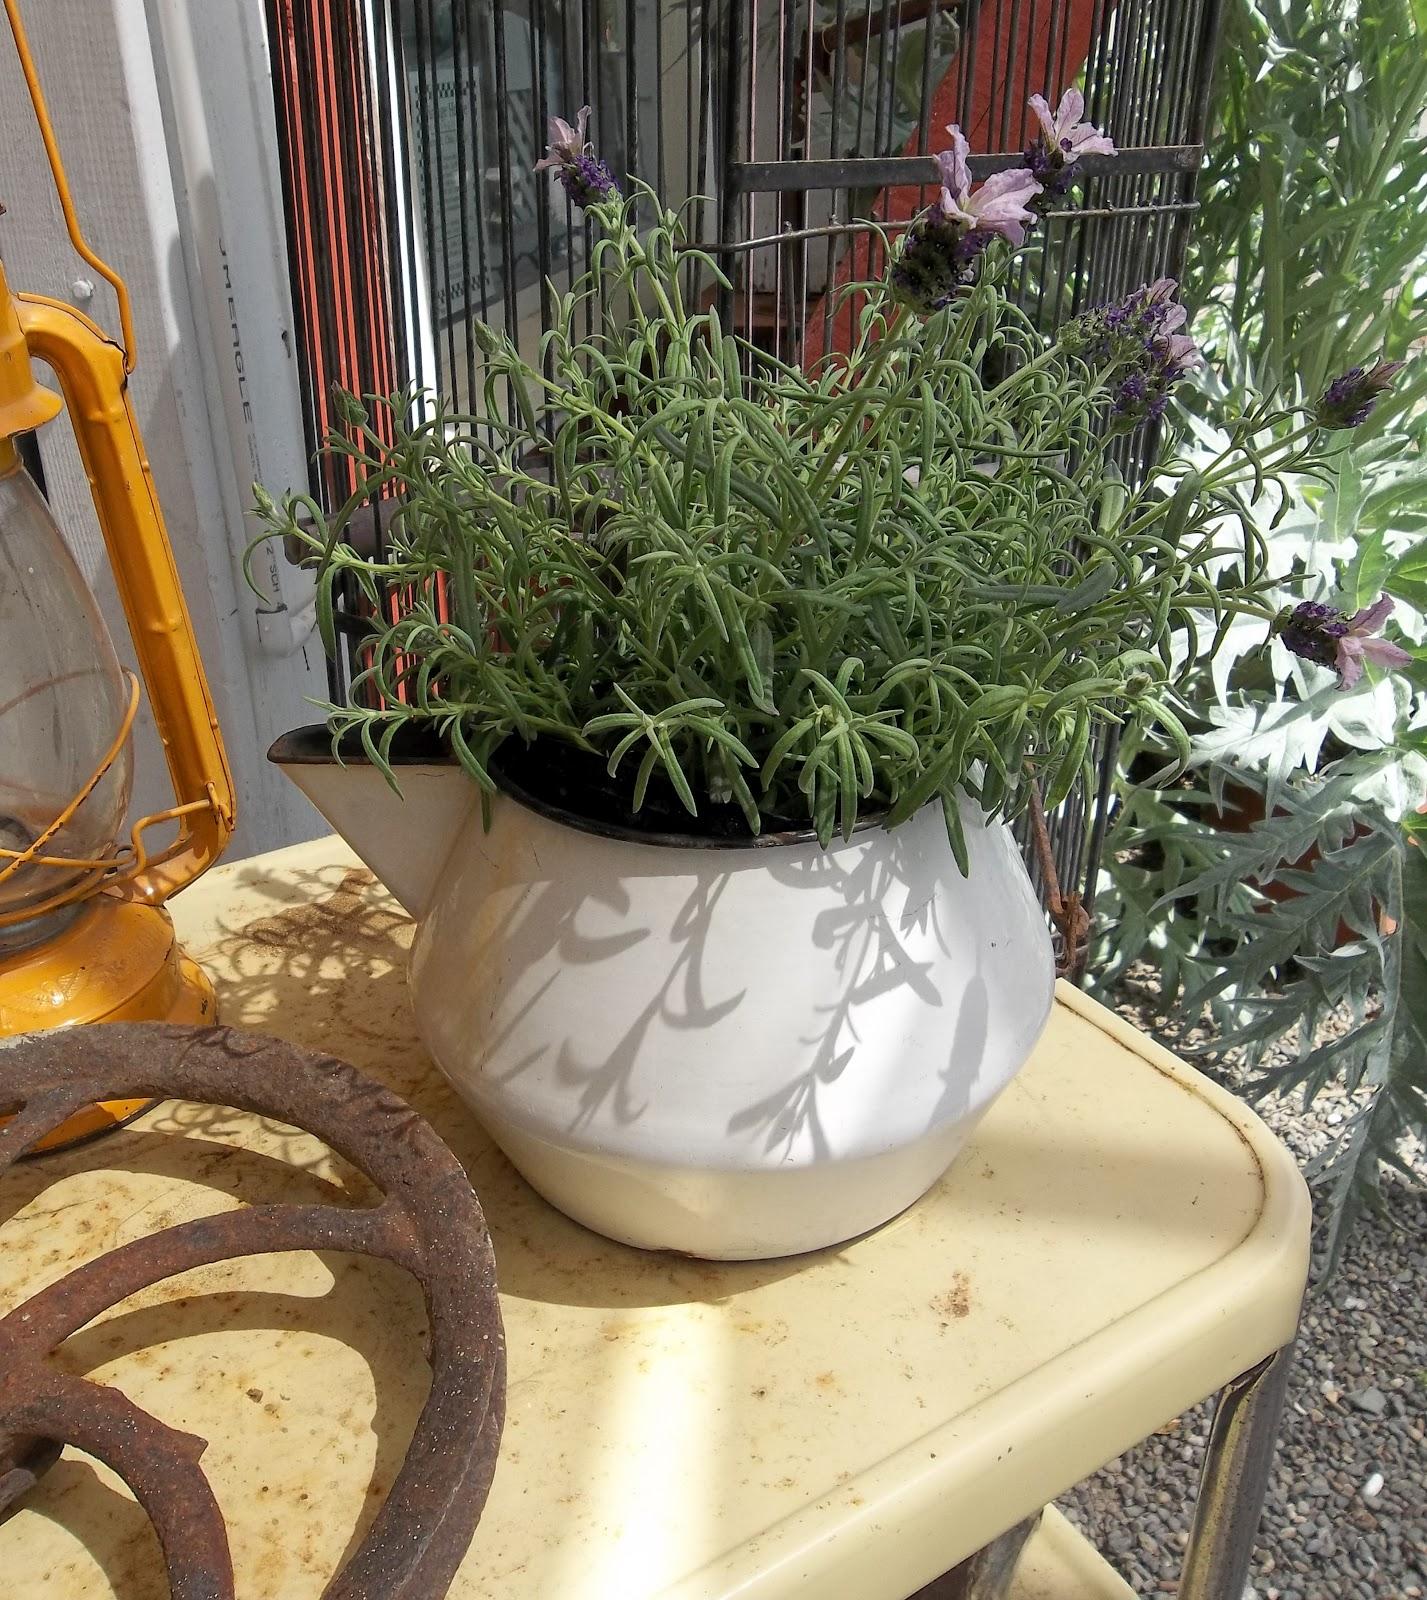 Container Gardening Ideas: Gin'Gilli's Vintage Home: Unique Container Gardening Ideas